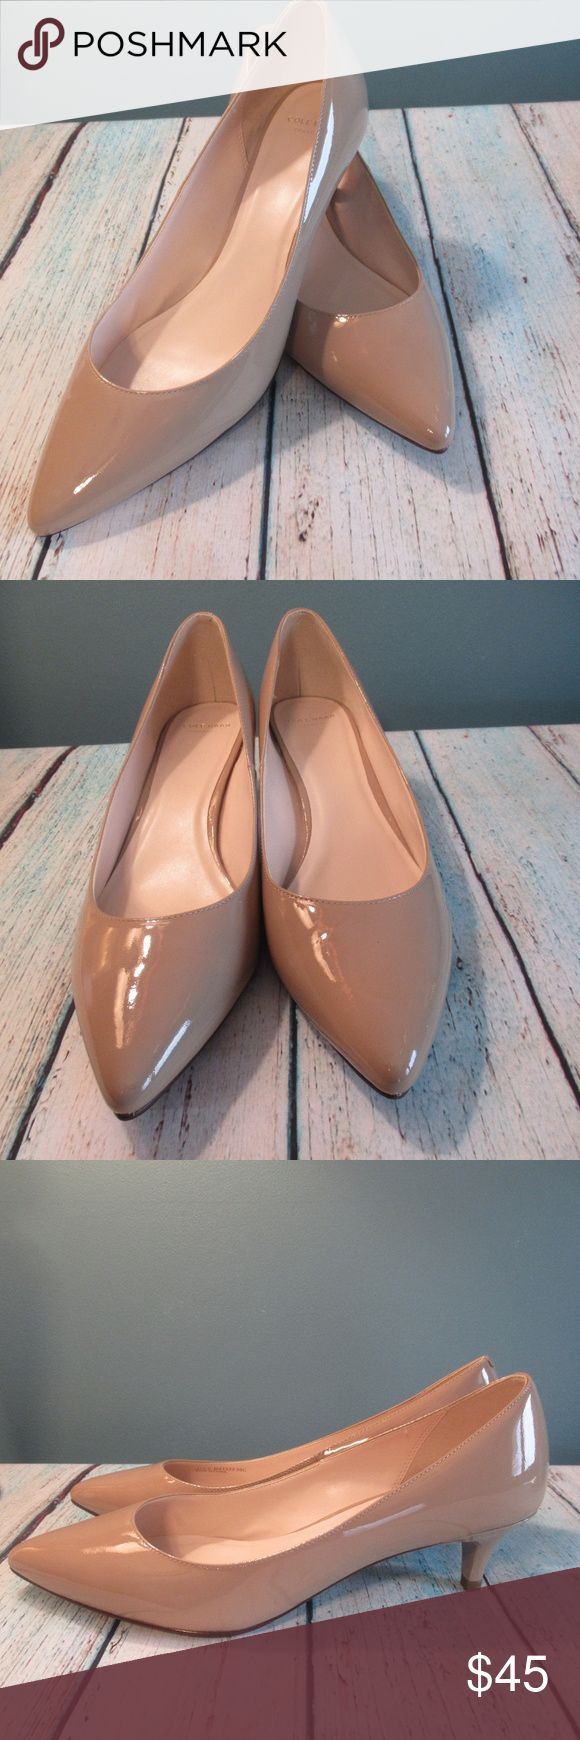 "Cole Haan Juliana Nude Kitten Heel Pump (Wide) Beautiful like new Cole Haan Juliana pump. Kitten heel design with pointed toe. Size 91/2C (wide). Nude patent leather. Heel measures 1.5"".  Thanks! Cole Haan Shoes Heels"